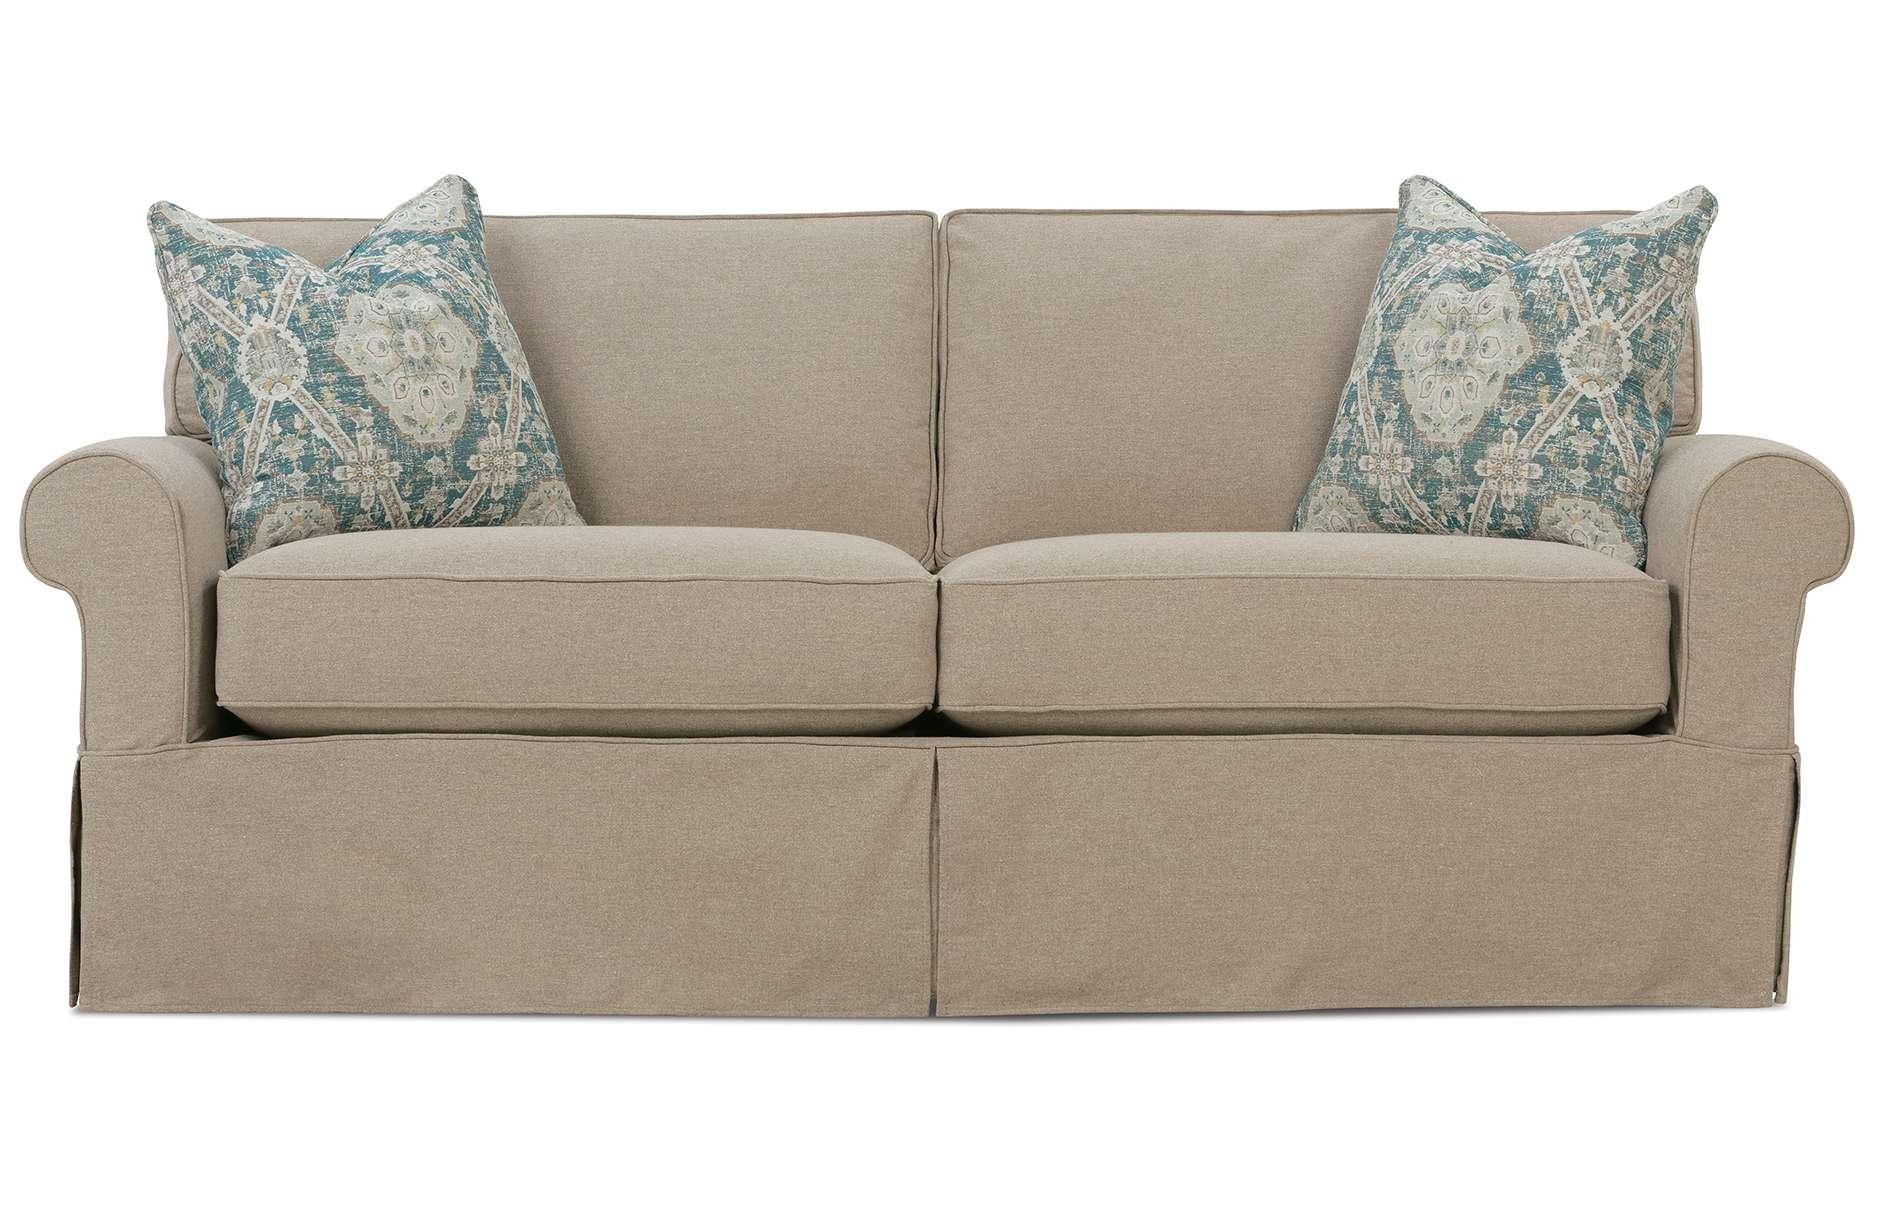 20 Choices Of Rowe Slipcovers Sofa Ideas